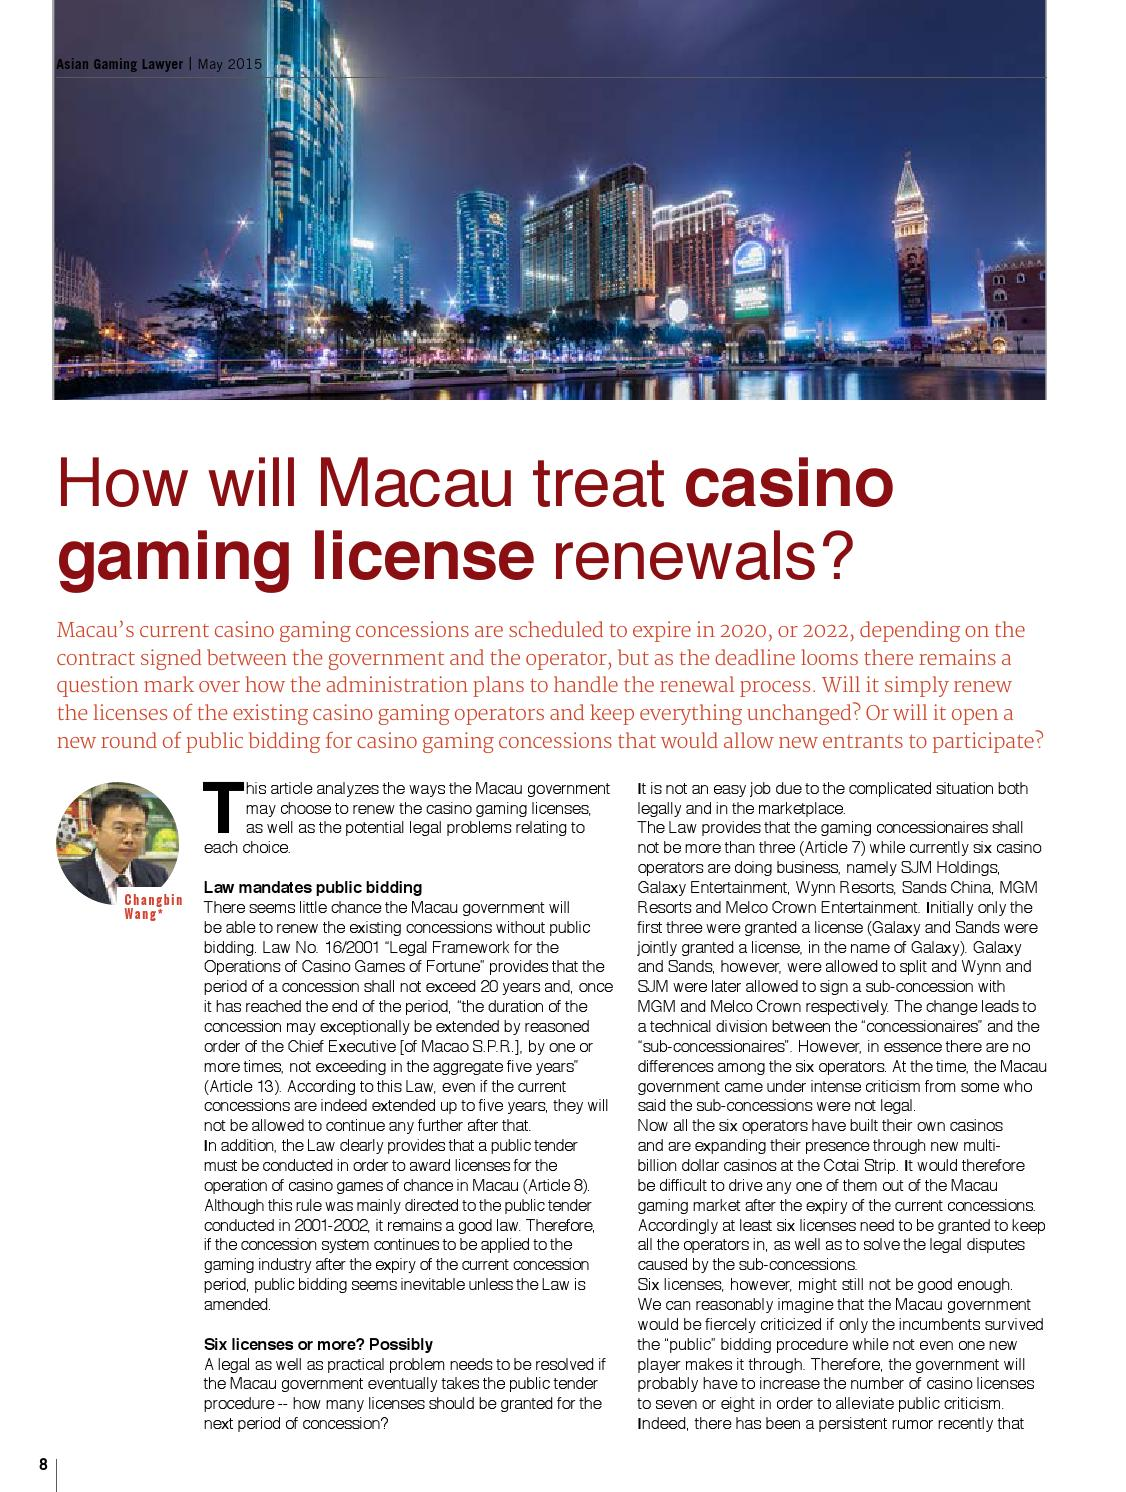 International masters of gambling law san manuel casino buffet